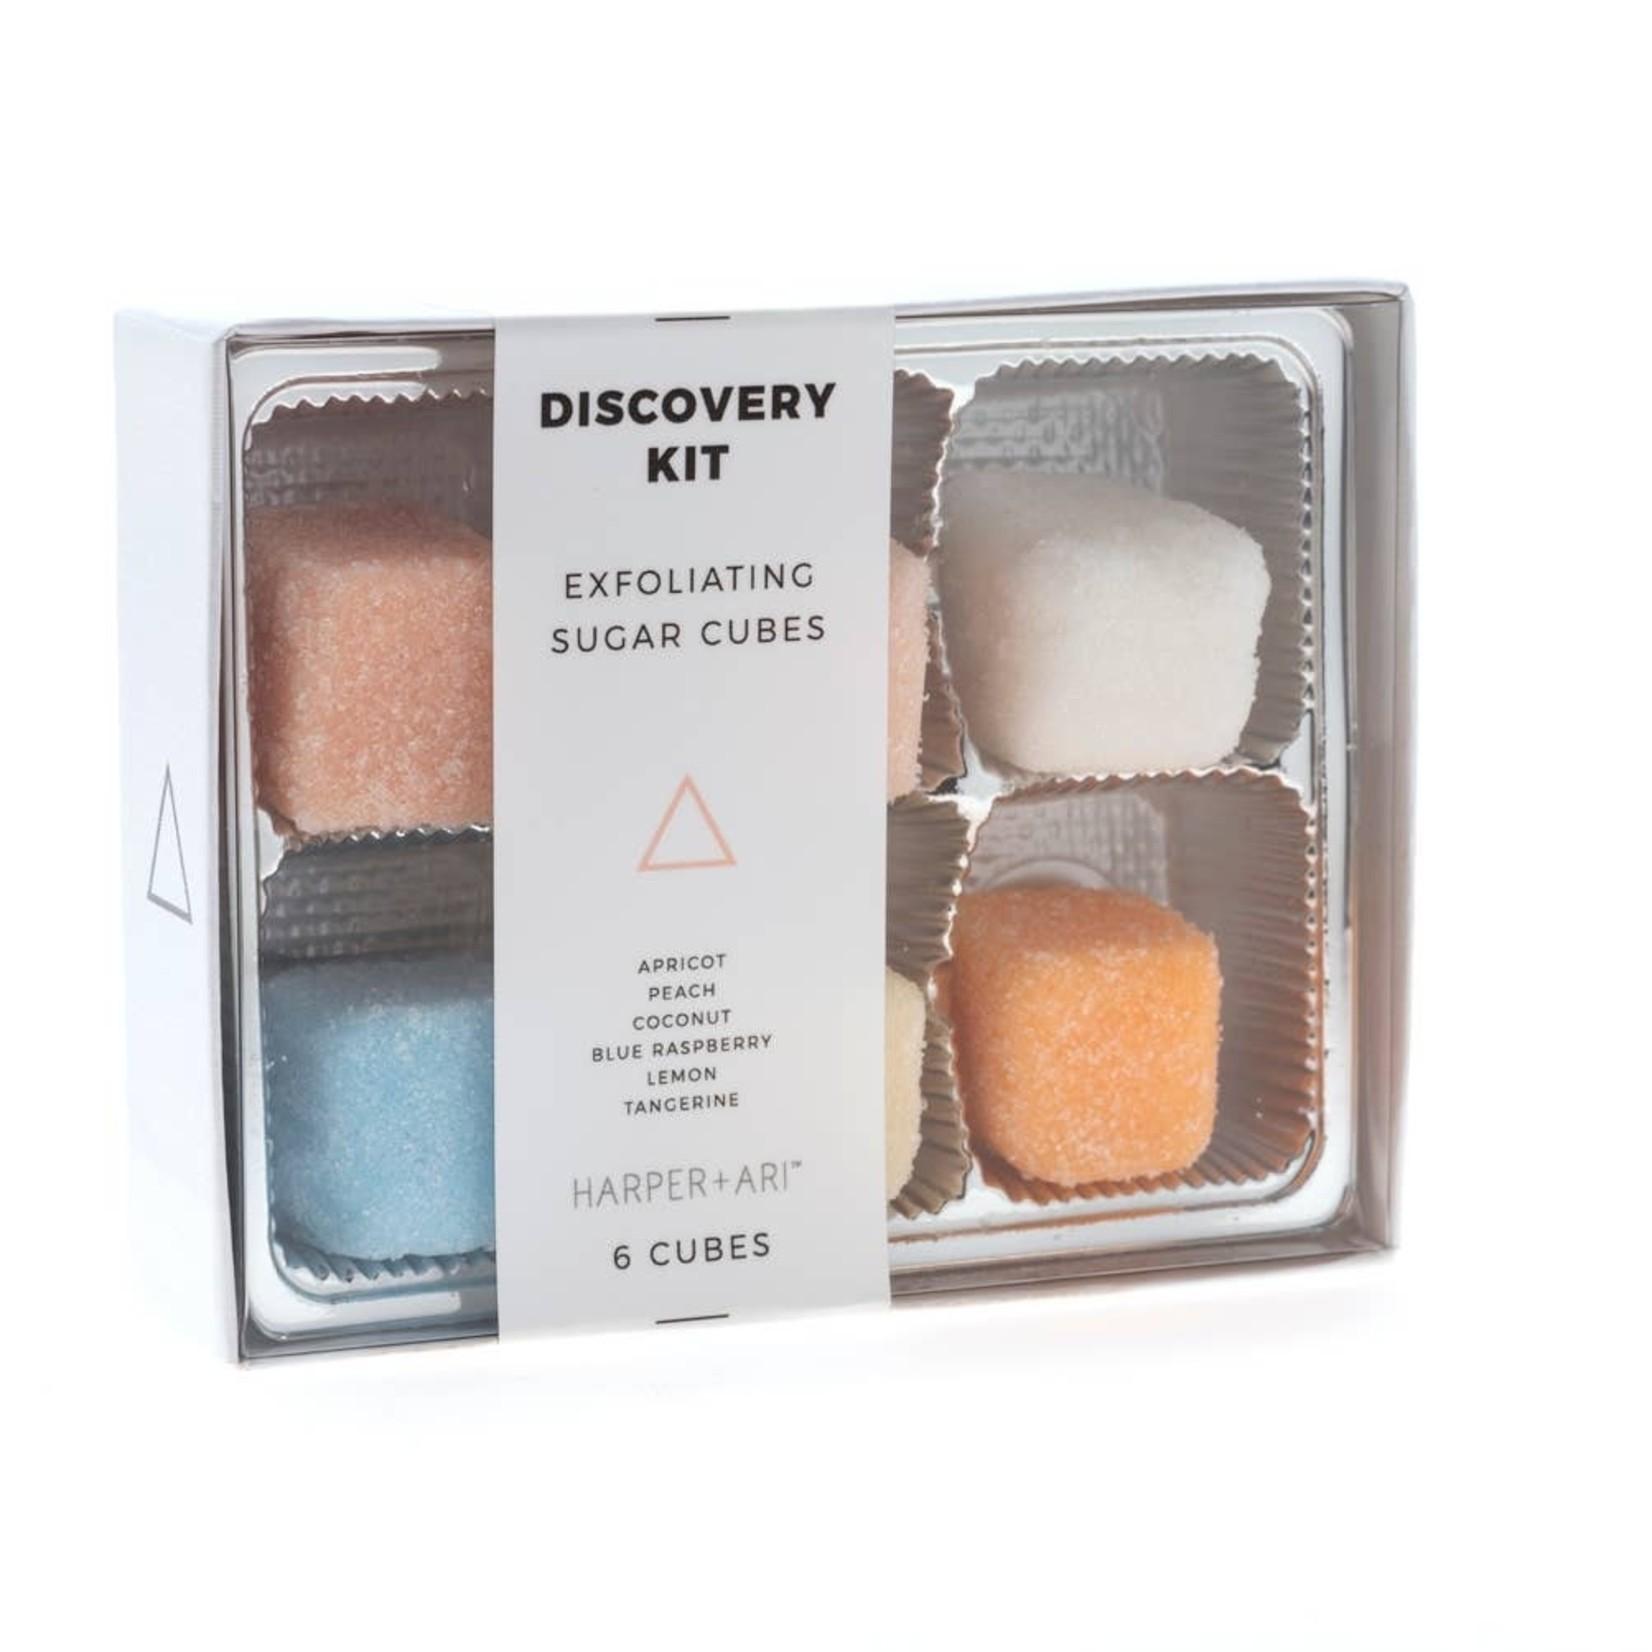 Harper Ari Discovery Kit | Gift Box Sugar Cubes